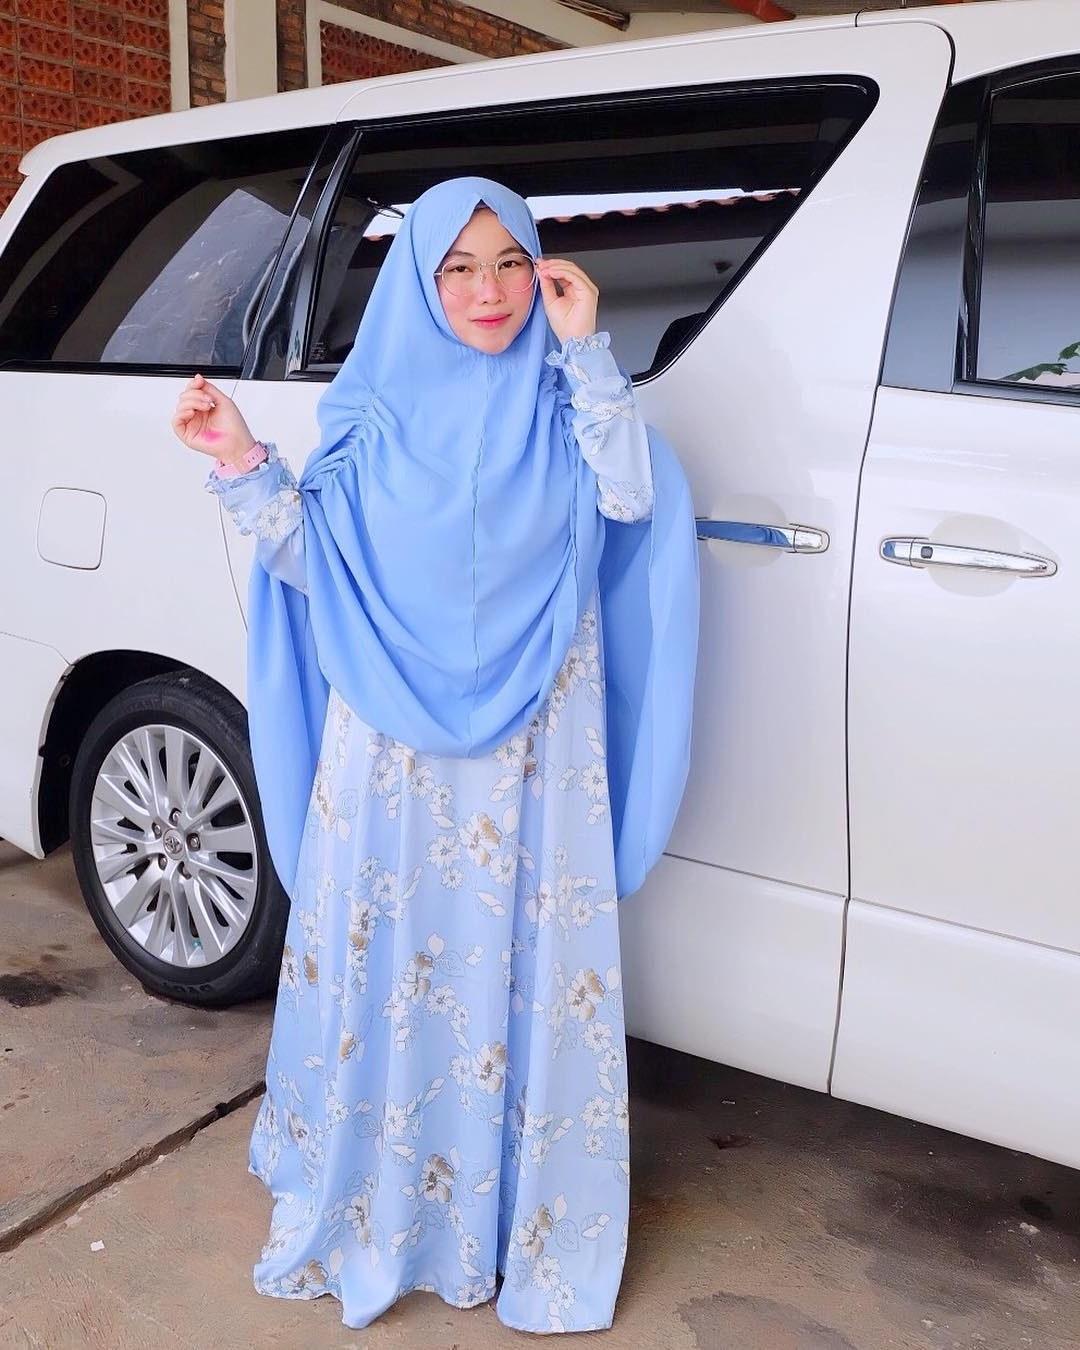 Bentuk Fashion Muslimah Terbaru 2020 Q0d4 21 Jubah Dress Muslimah Moden & Gorgeous Dresses 2020 Terbaik